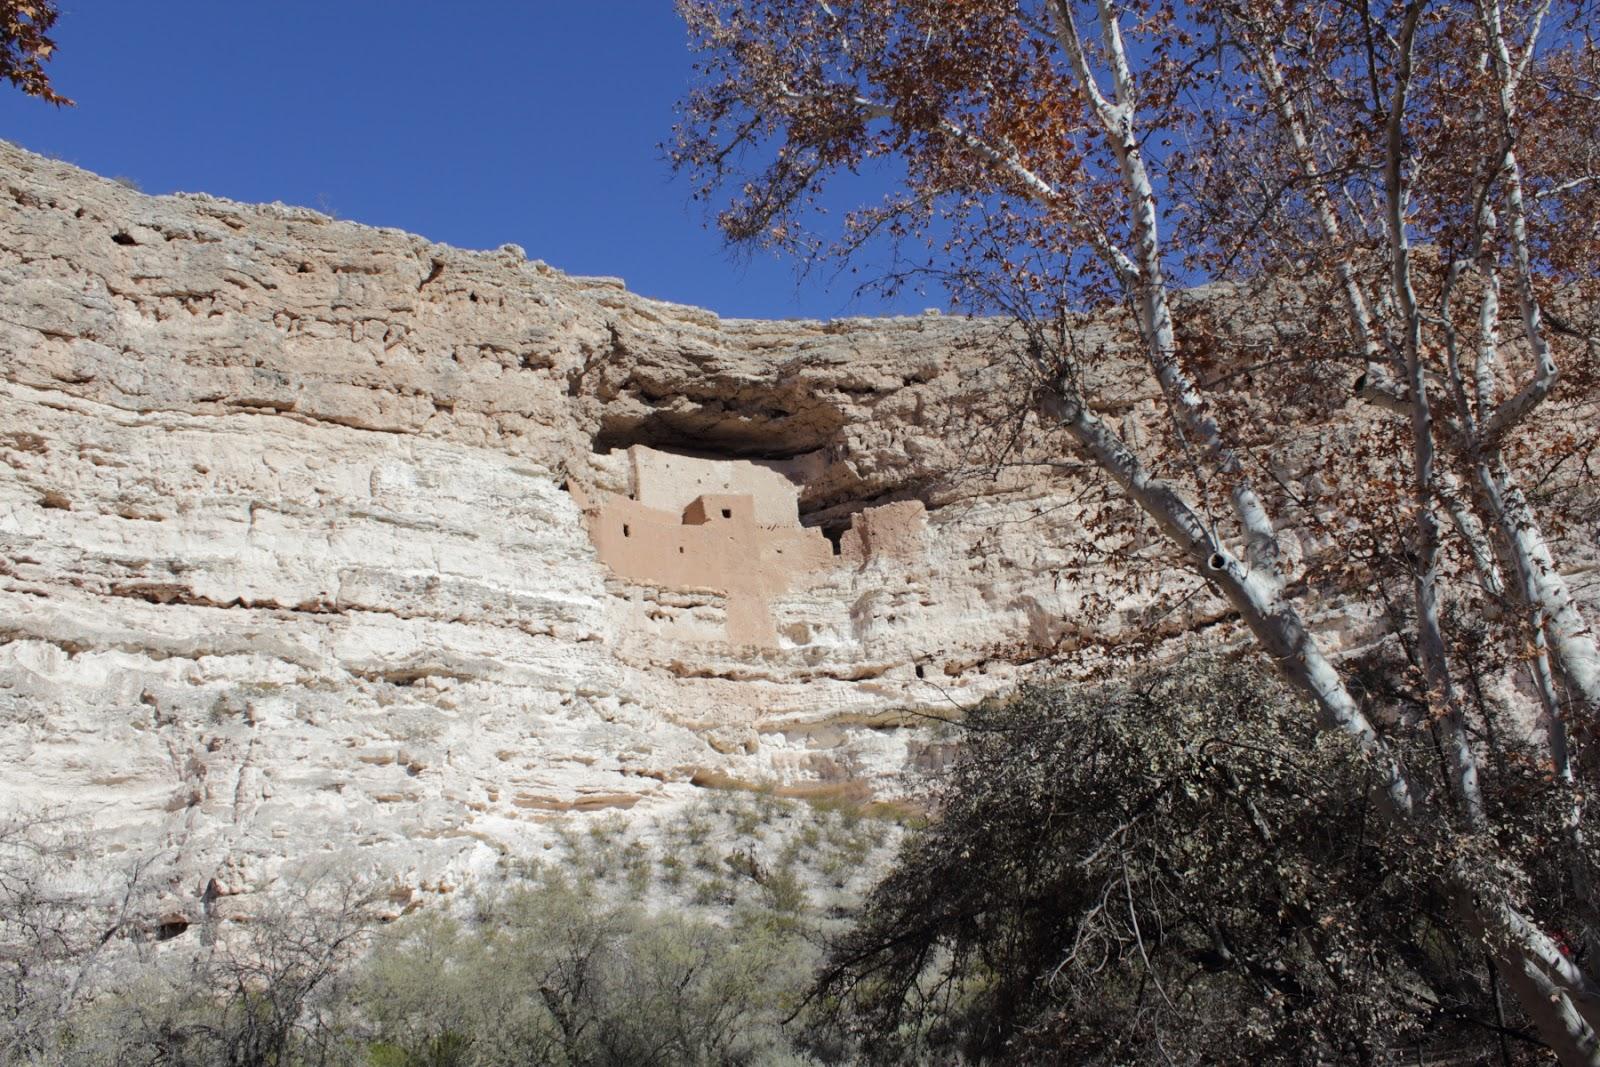 Montezuma Castle National Monument  http://www.nps.gov/moca/index.htm